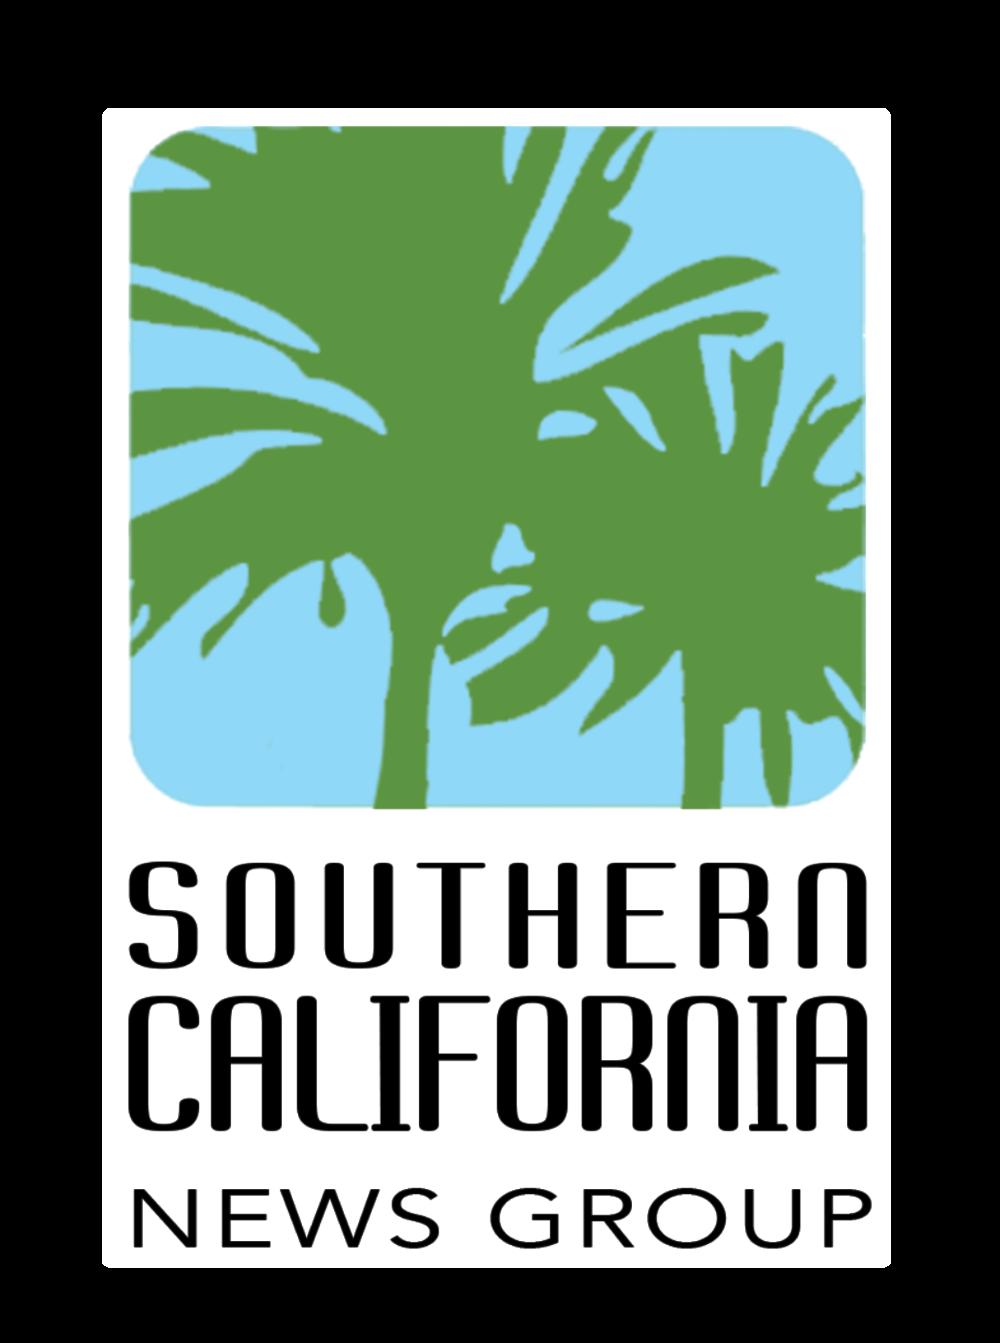 Southern Newspaper logo